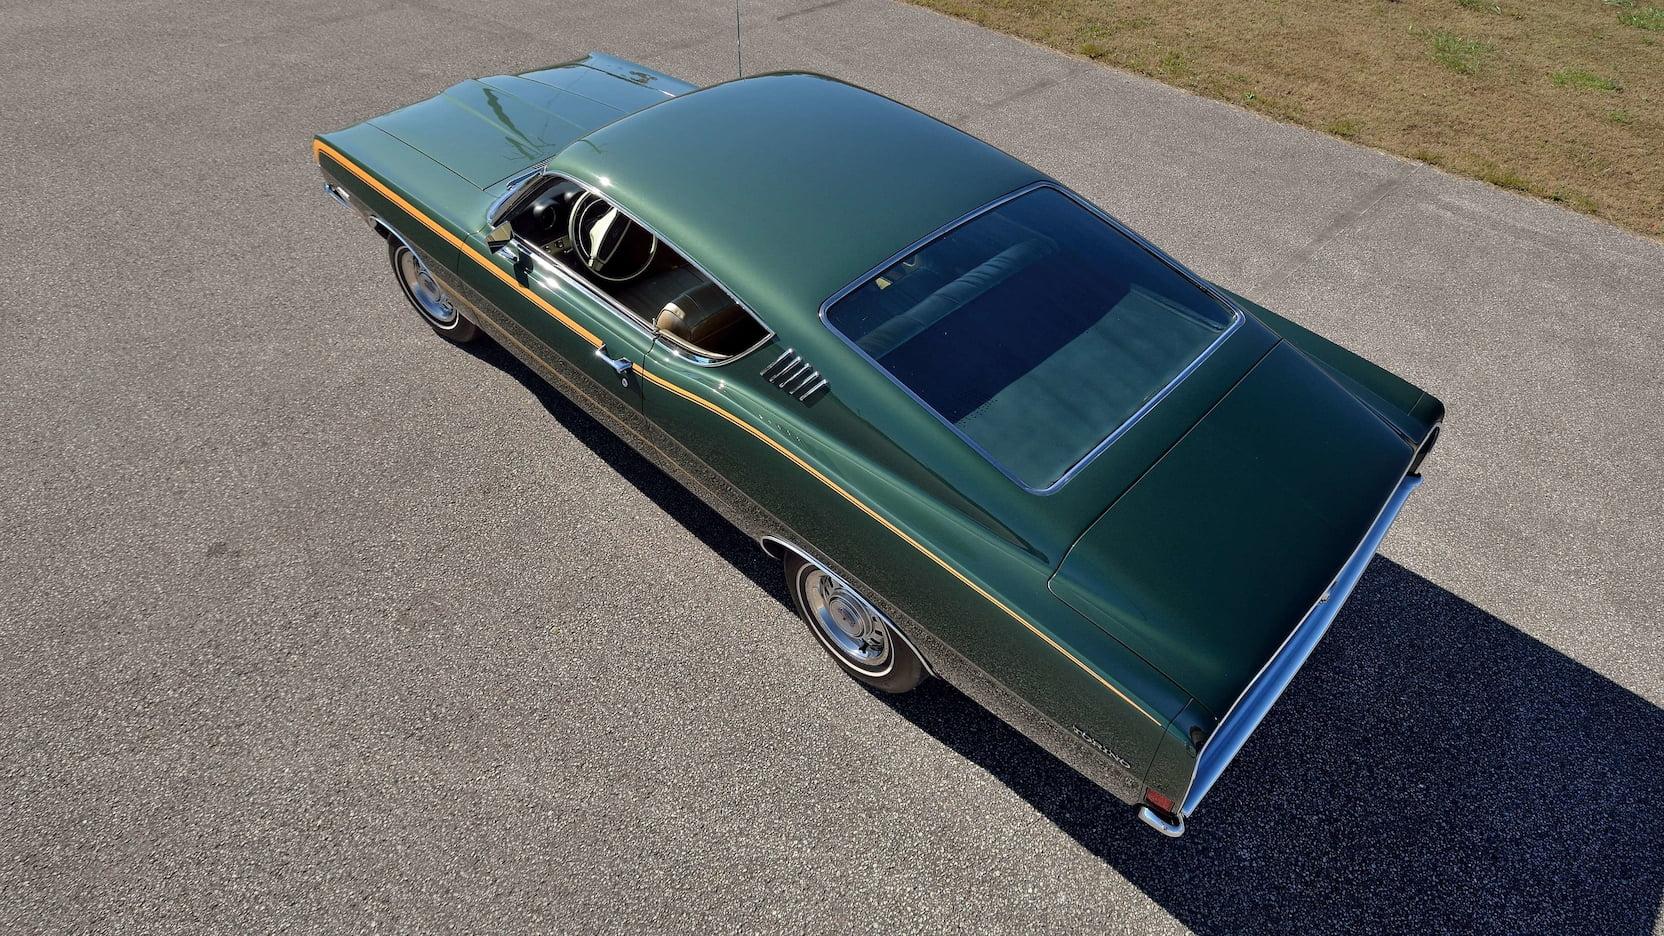 1968 Ford Torino GT overhead